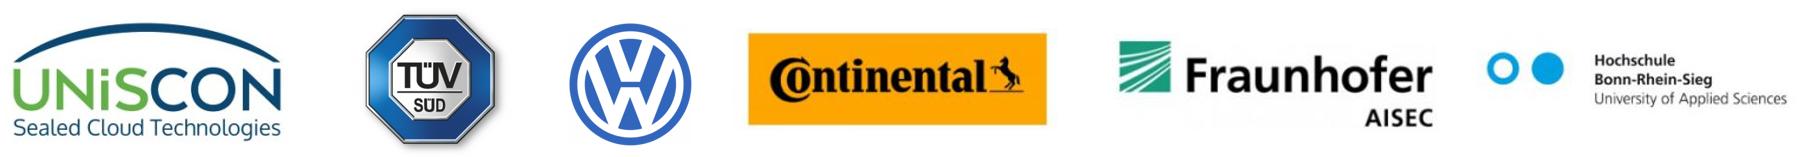 Logo Reihe carbits